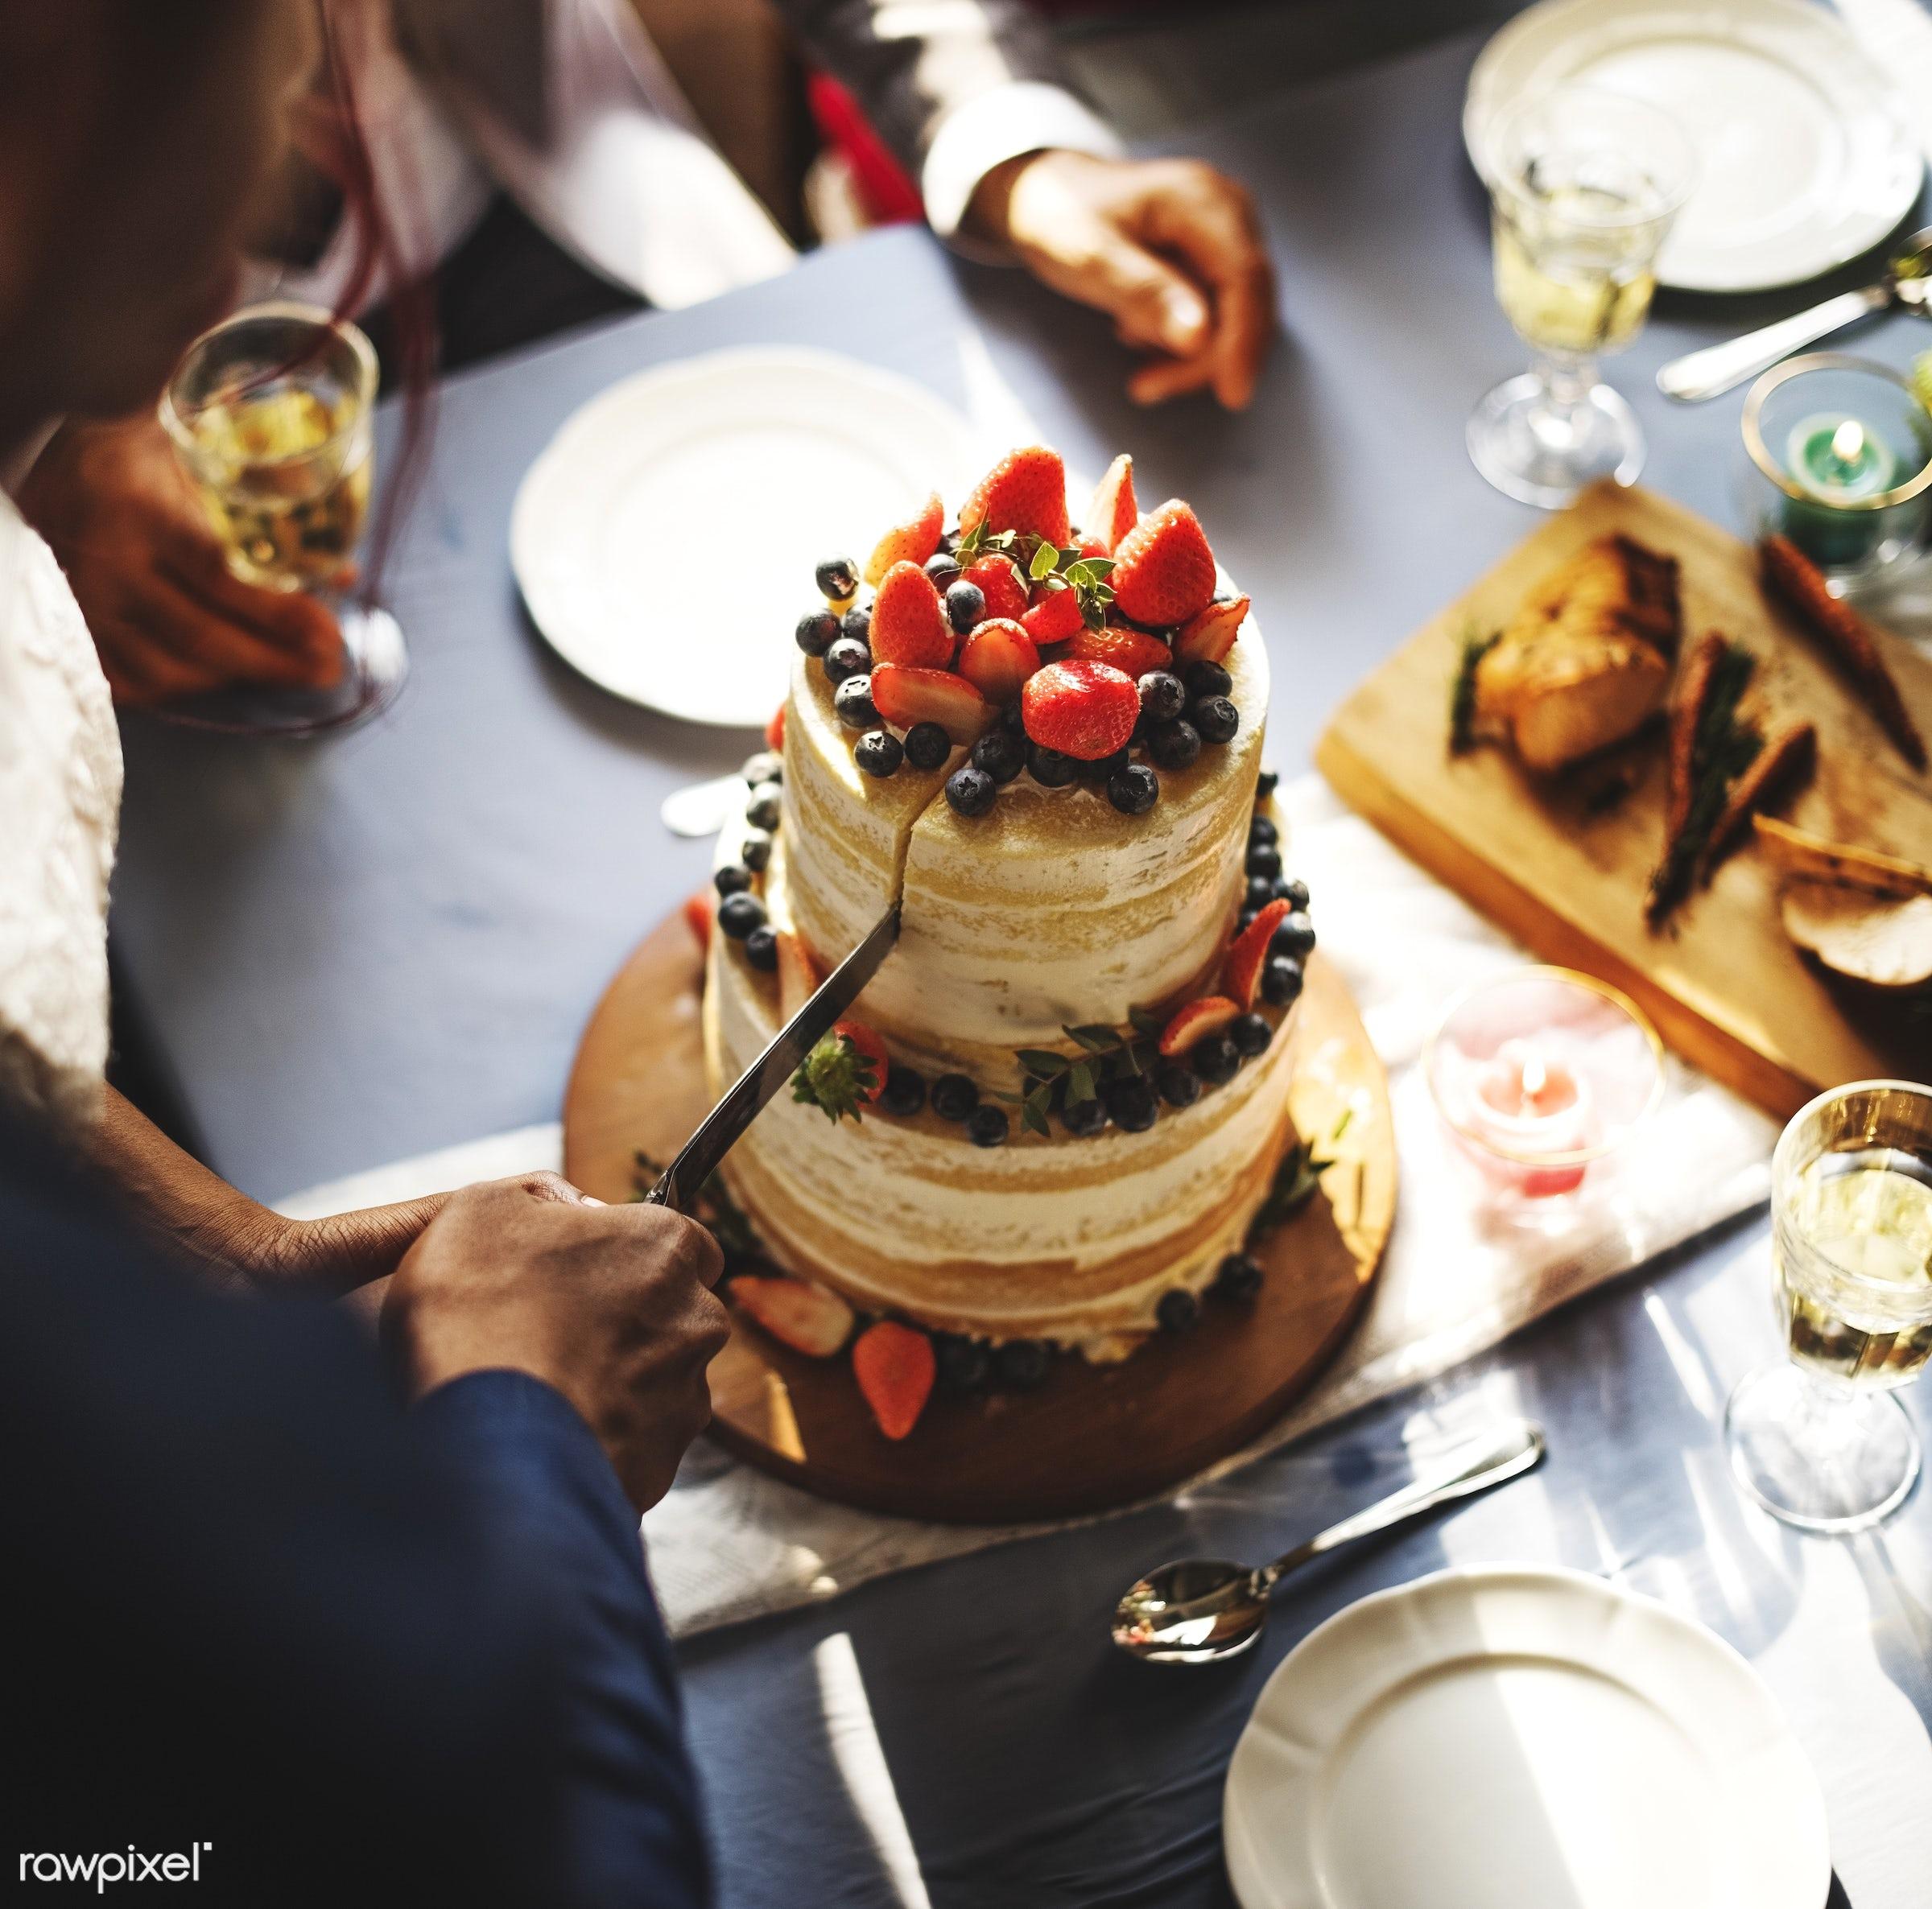 cake, bride, celebrate, celebration, ceremony, closeup, congrats, congratulations, couple, cut, dessert, diversity, elegance...